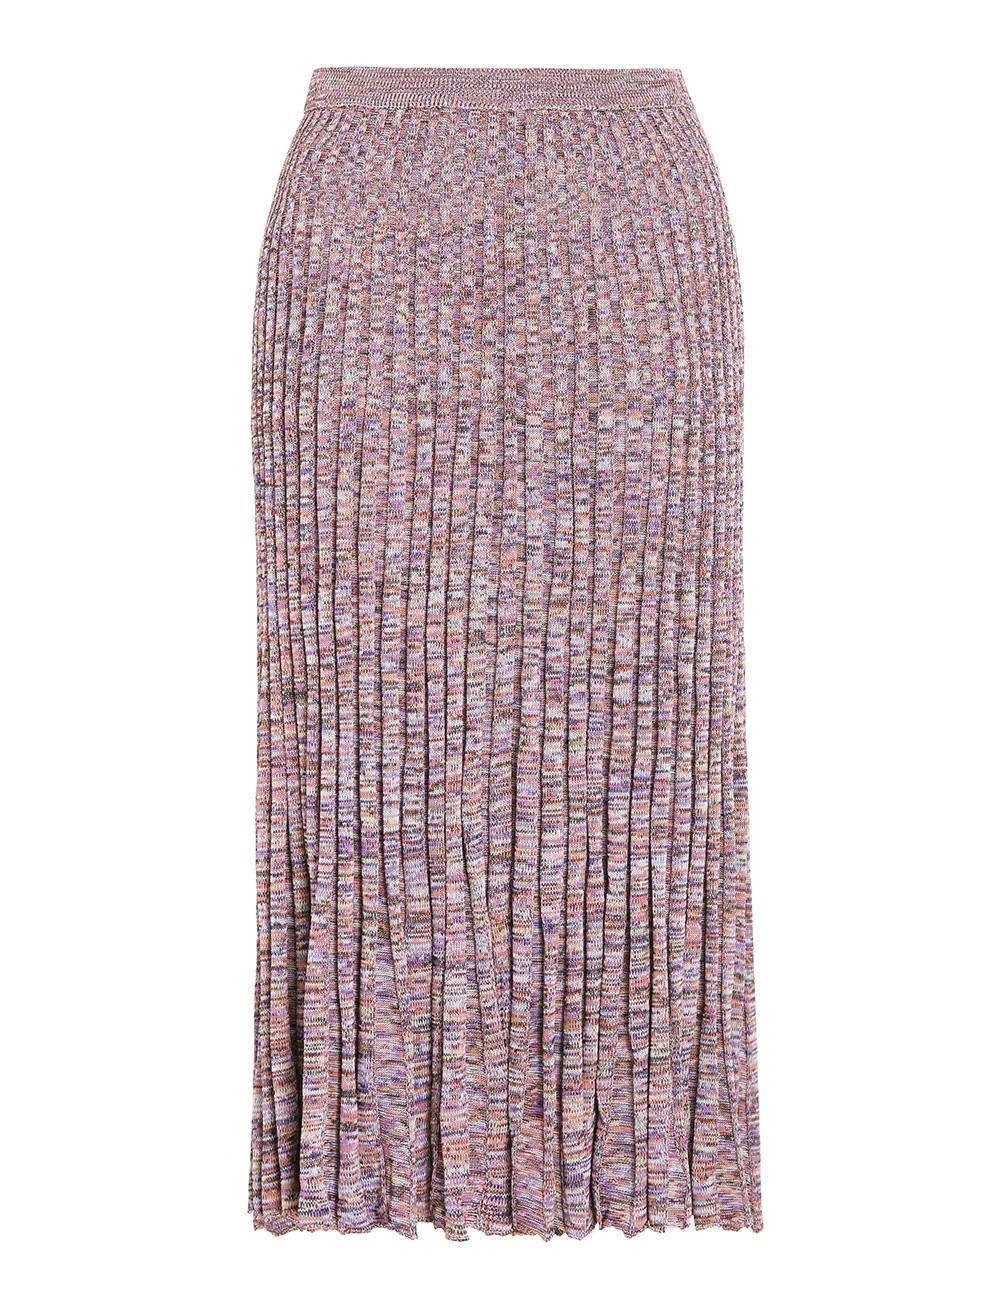 Botanica Mouline Skirt